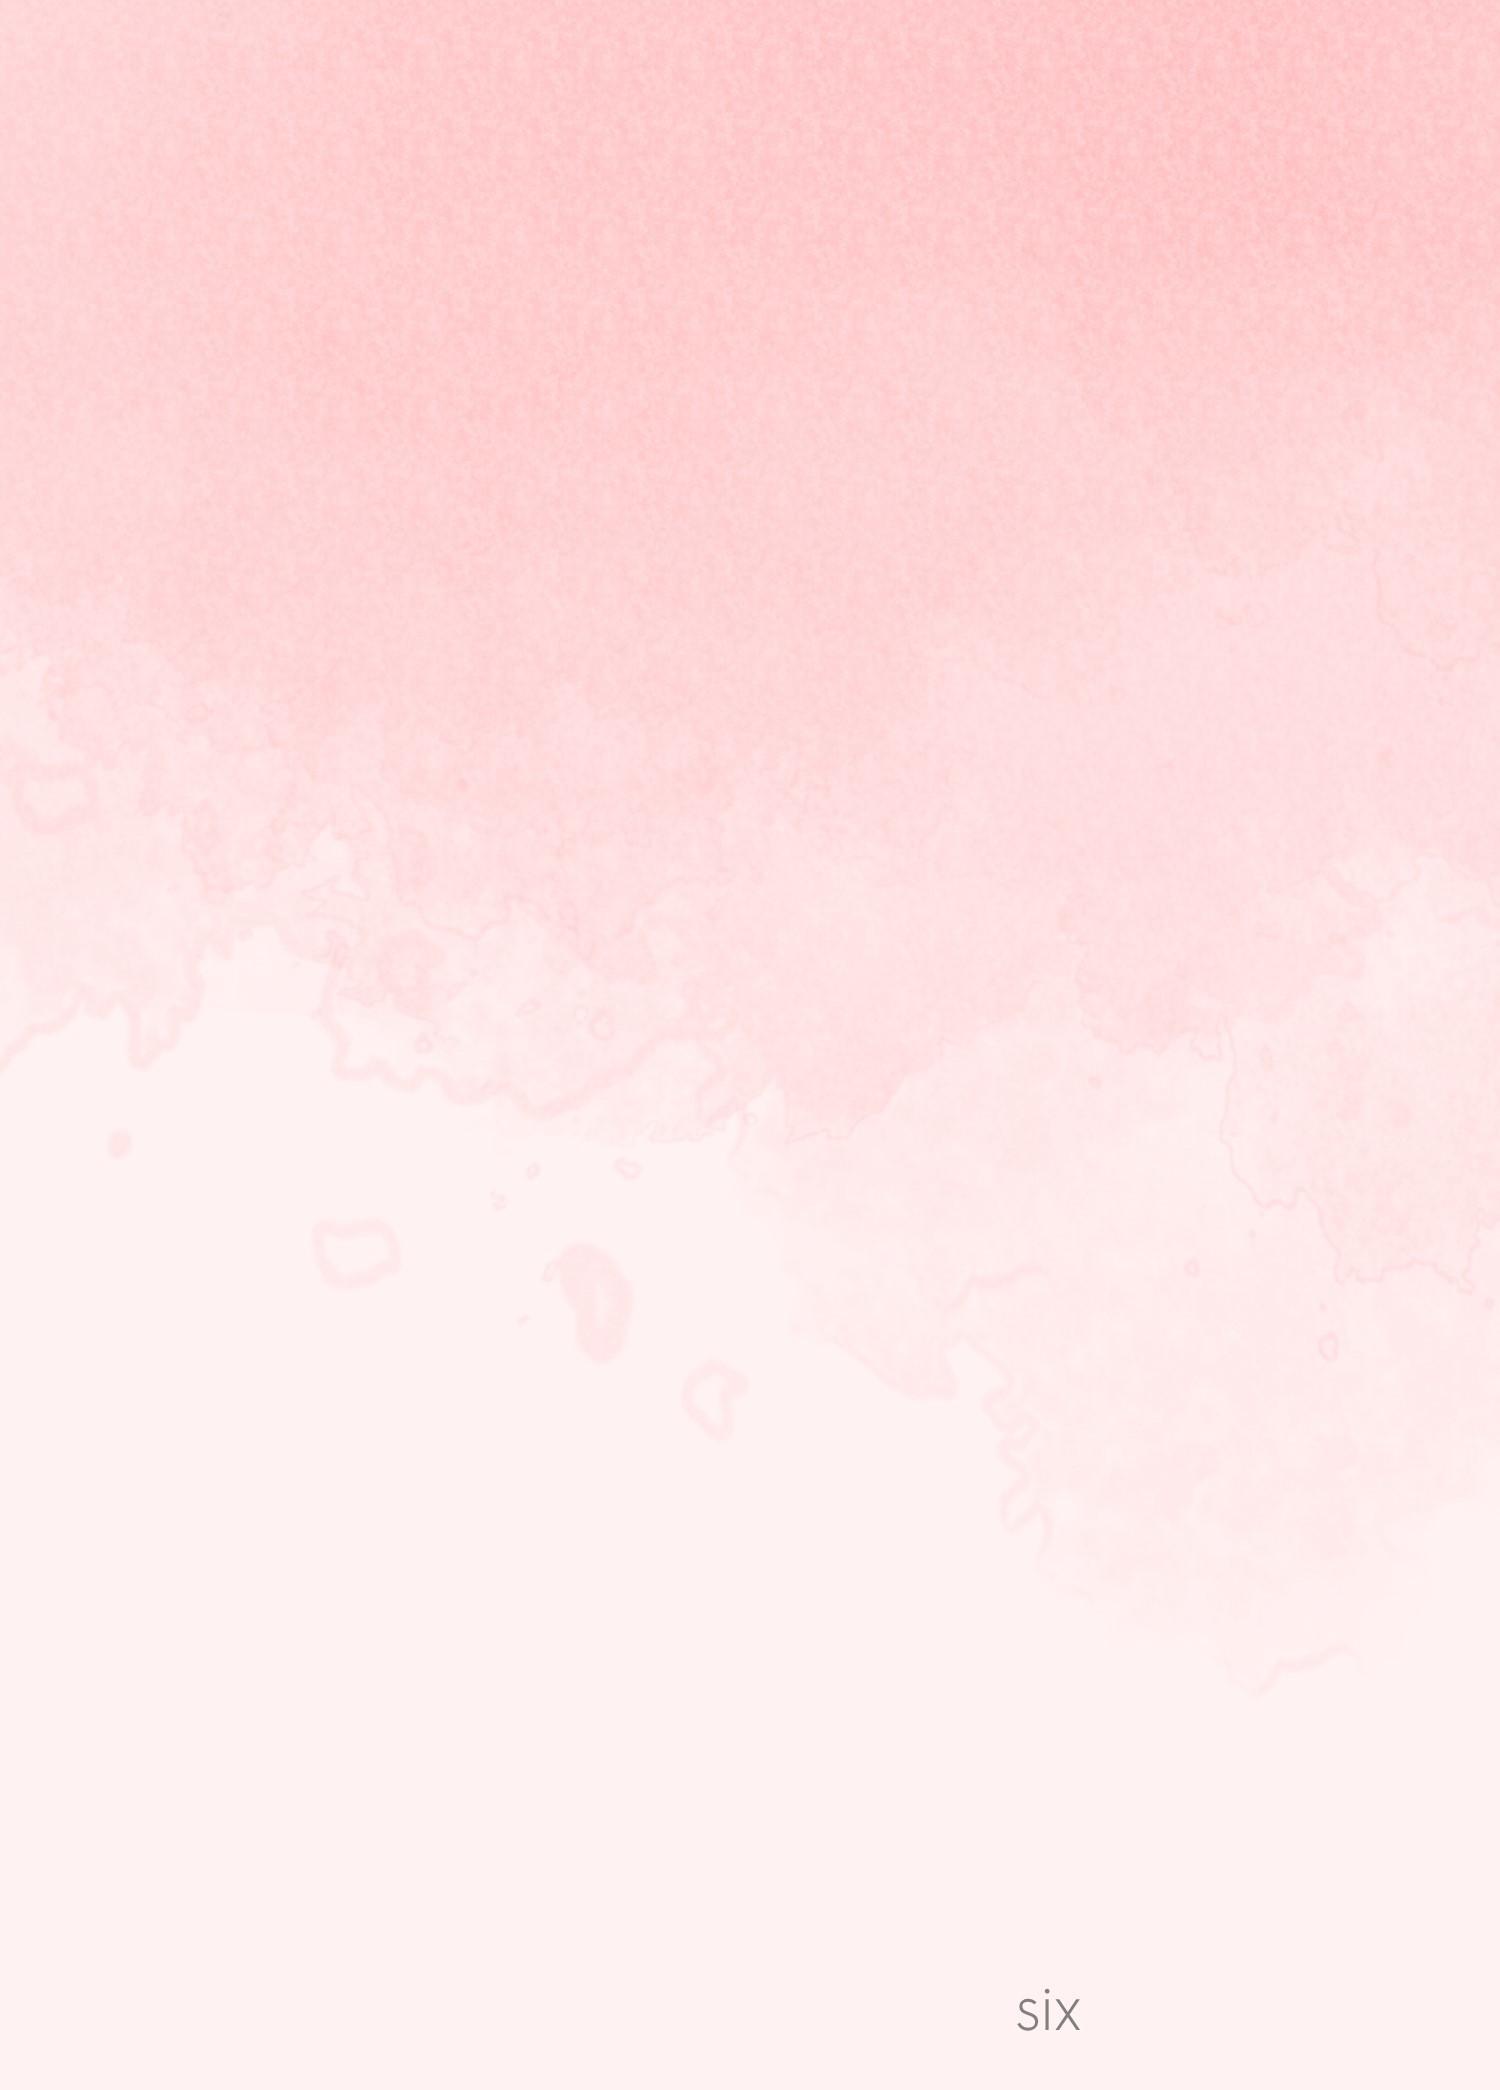 Light pink wallpapers 67 images - Pastel pink wallpaper hd ...